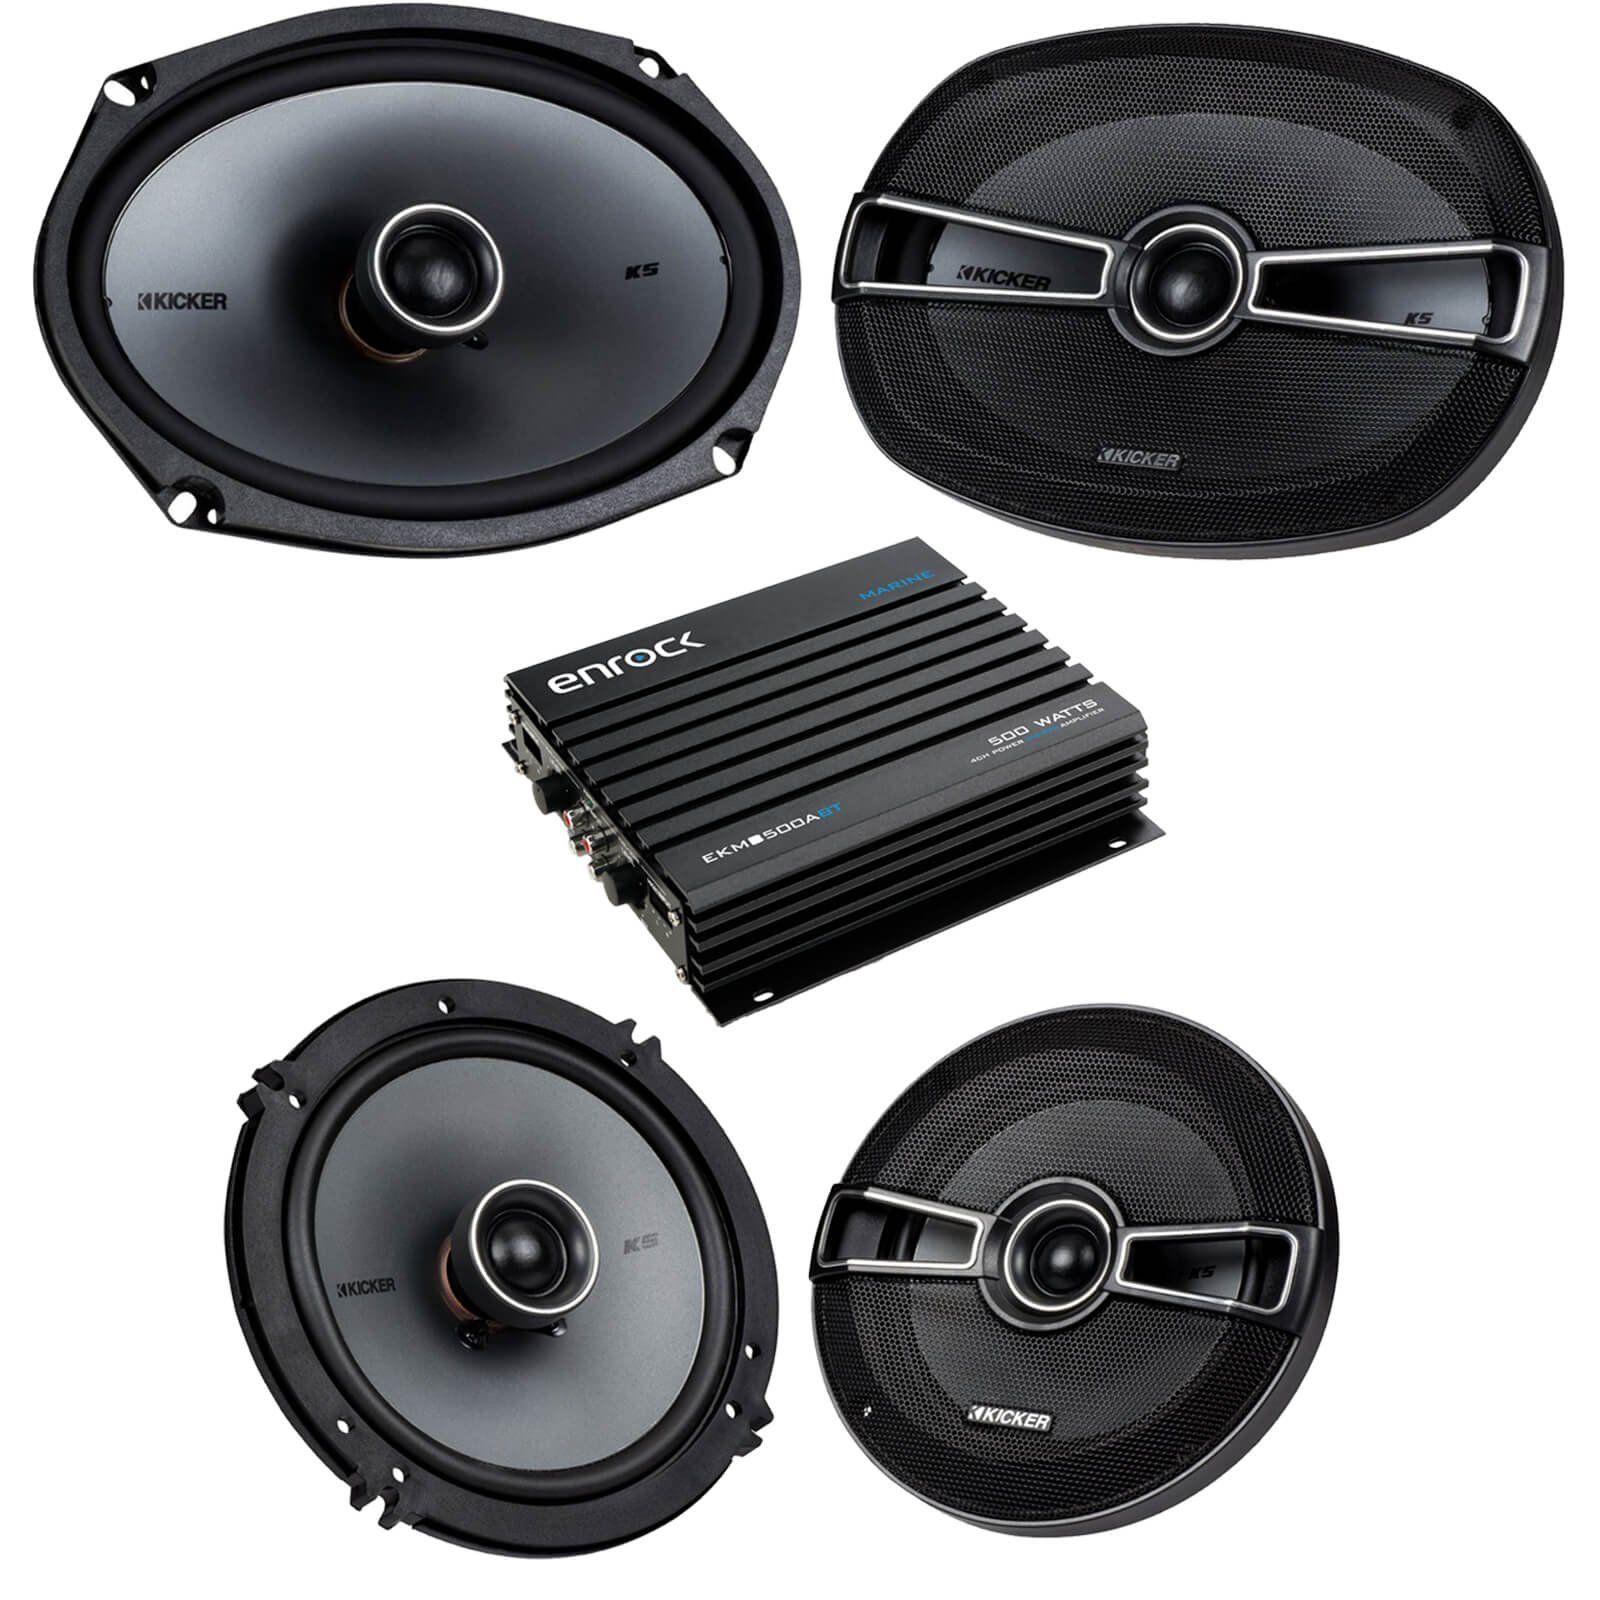 medium resolution of car speaker bluetooth streming set bundle combo with 2 kicker 41ksc654 6 5 inch 2 way vehicle stereo speakers 2 kicker 41ksc694 6x9 car speaker system